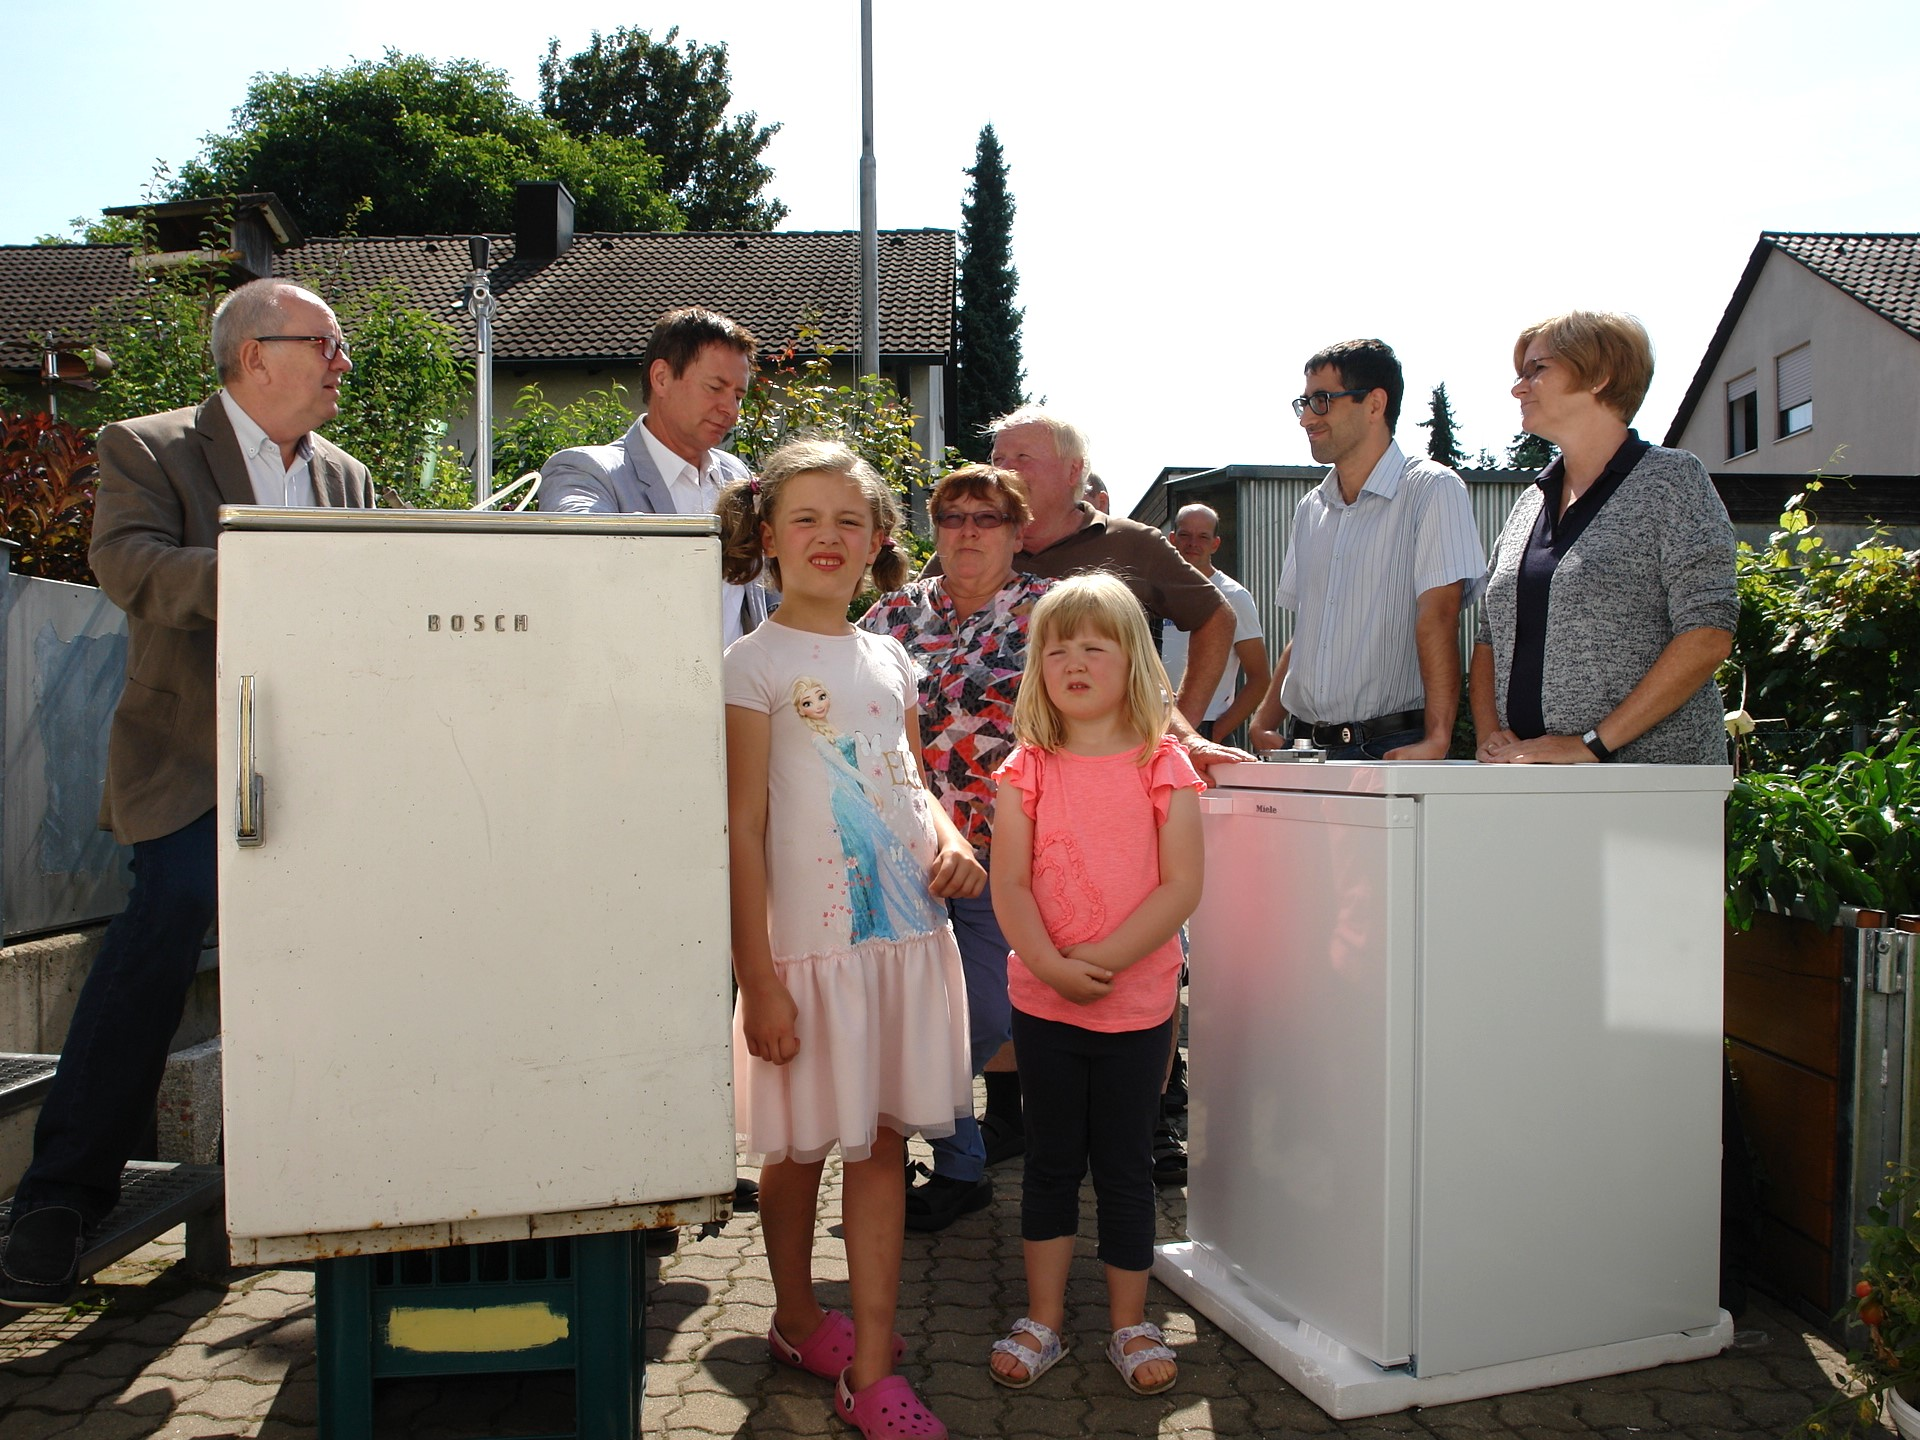 Bosch Kühlschrank Preise : Ältester kühlschrank bürgerhaus neumarkt